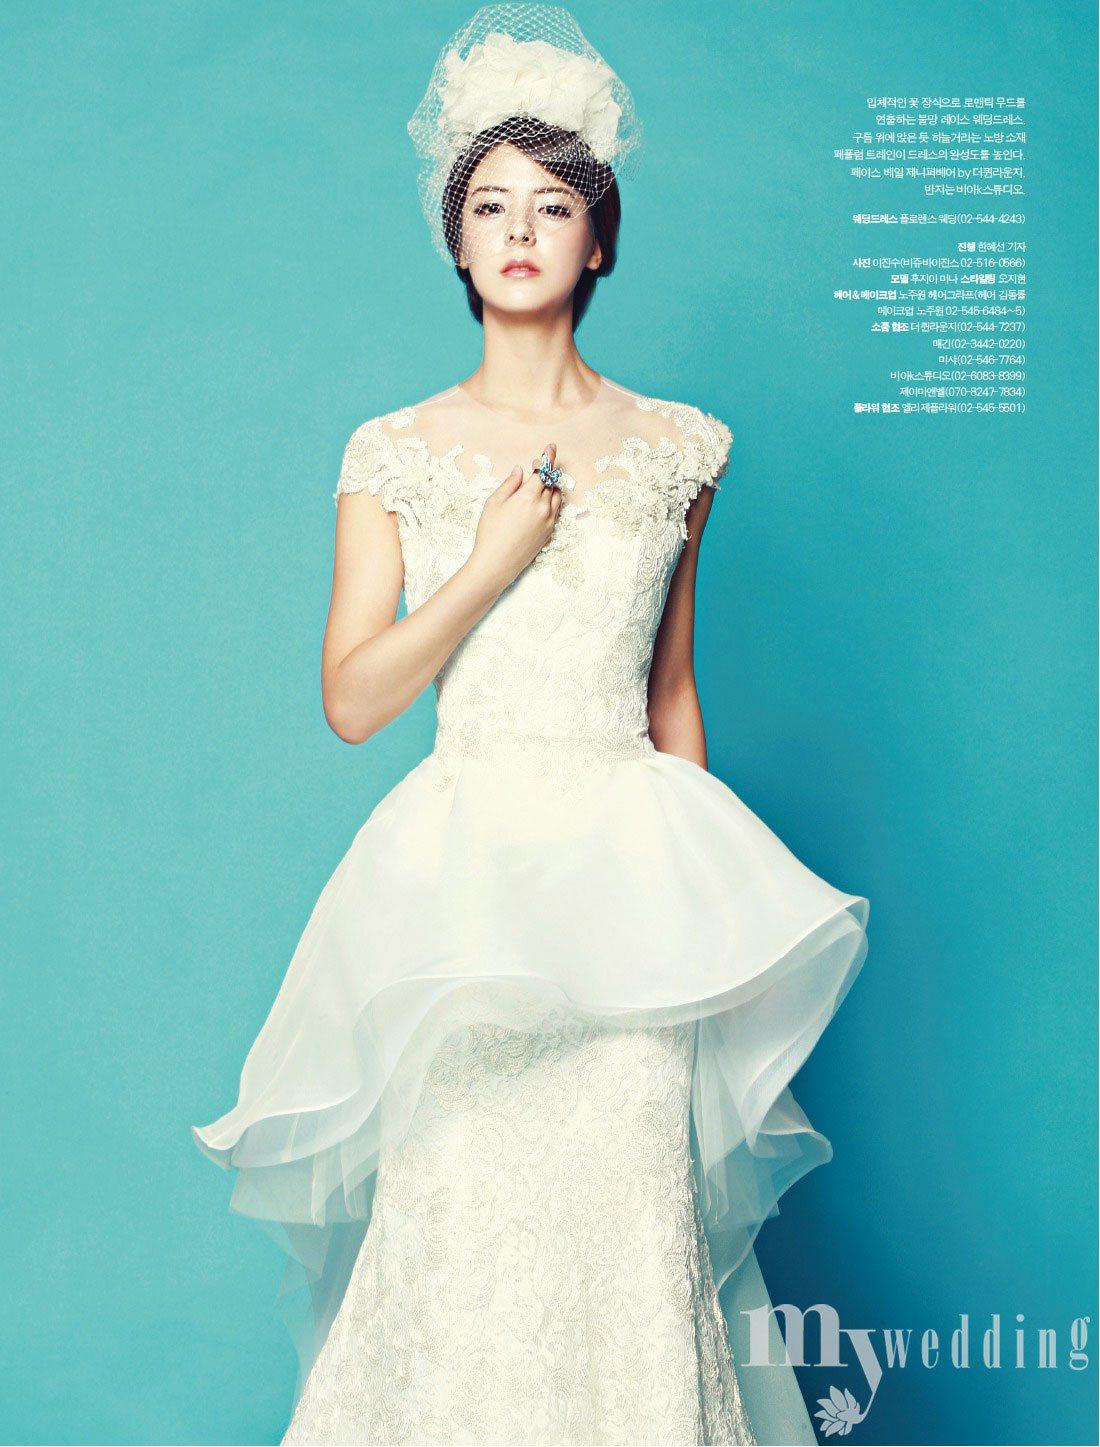 mina-fujii-wedding-magazine-8